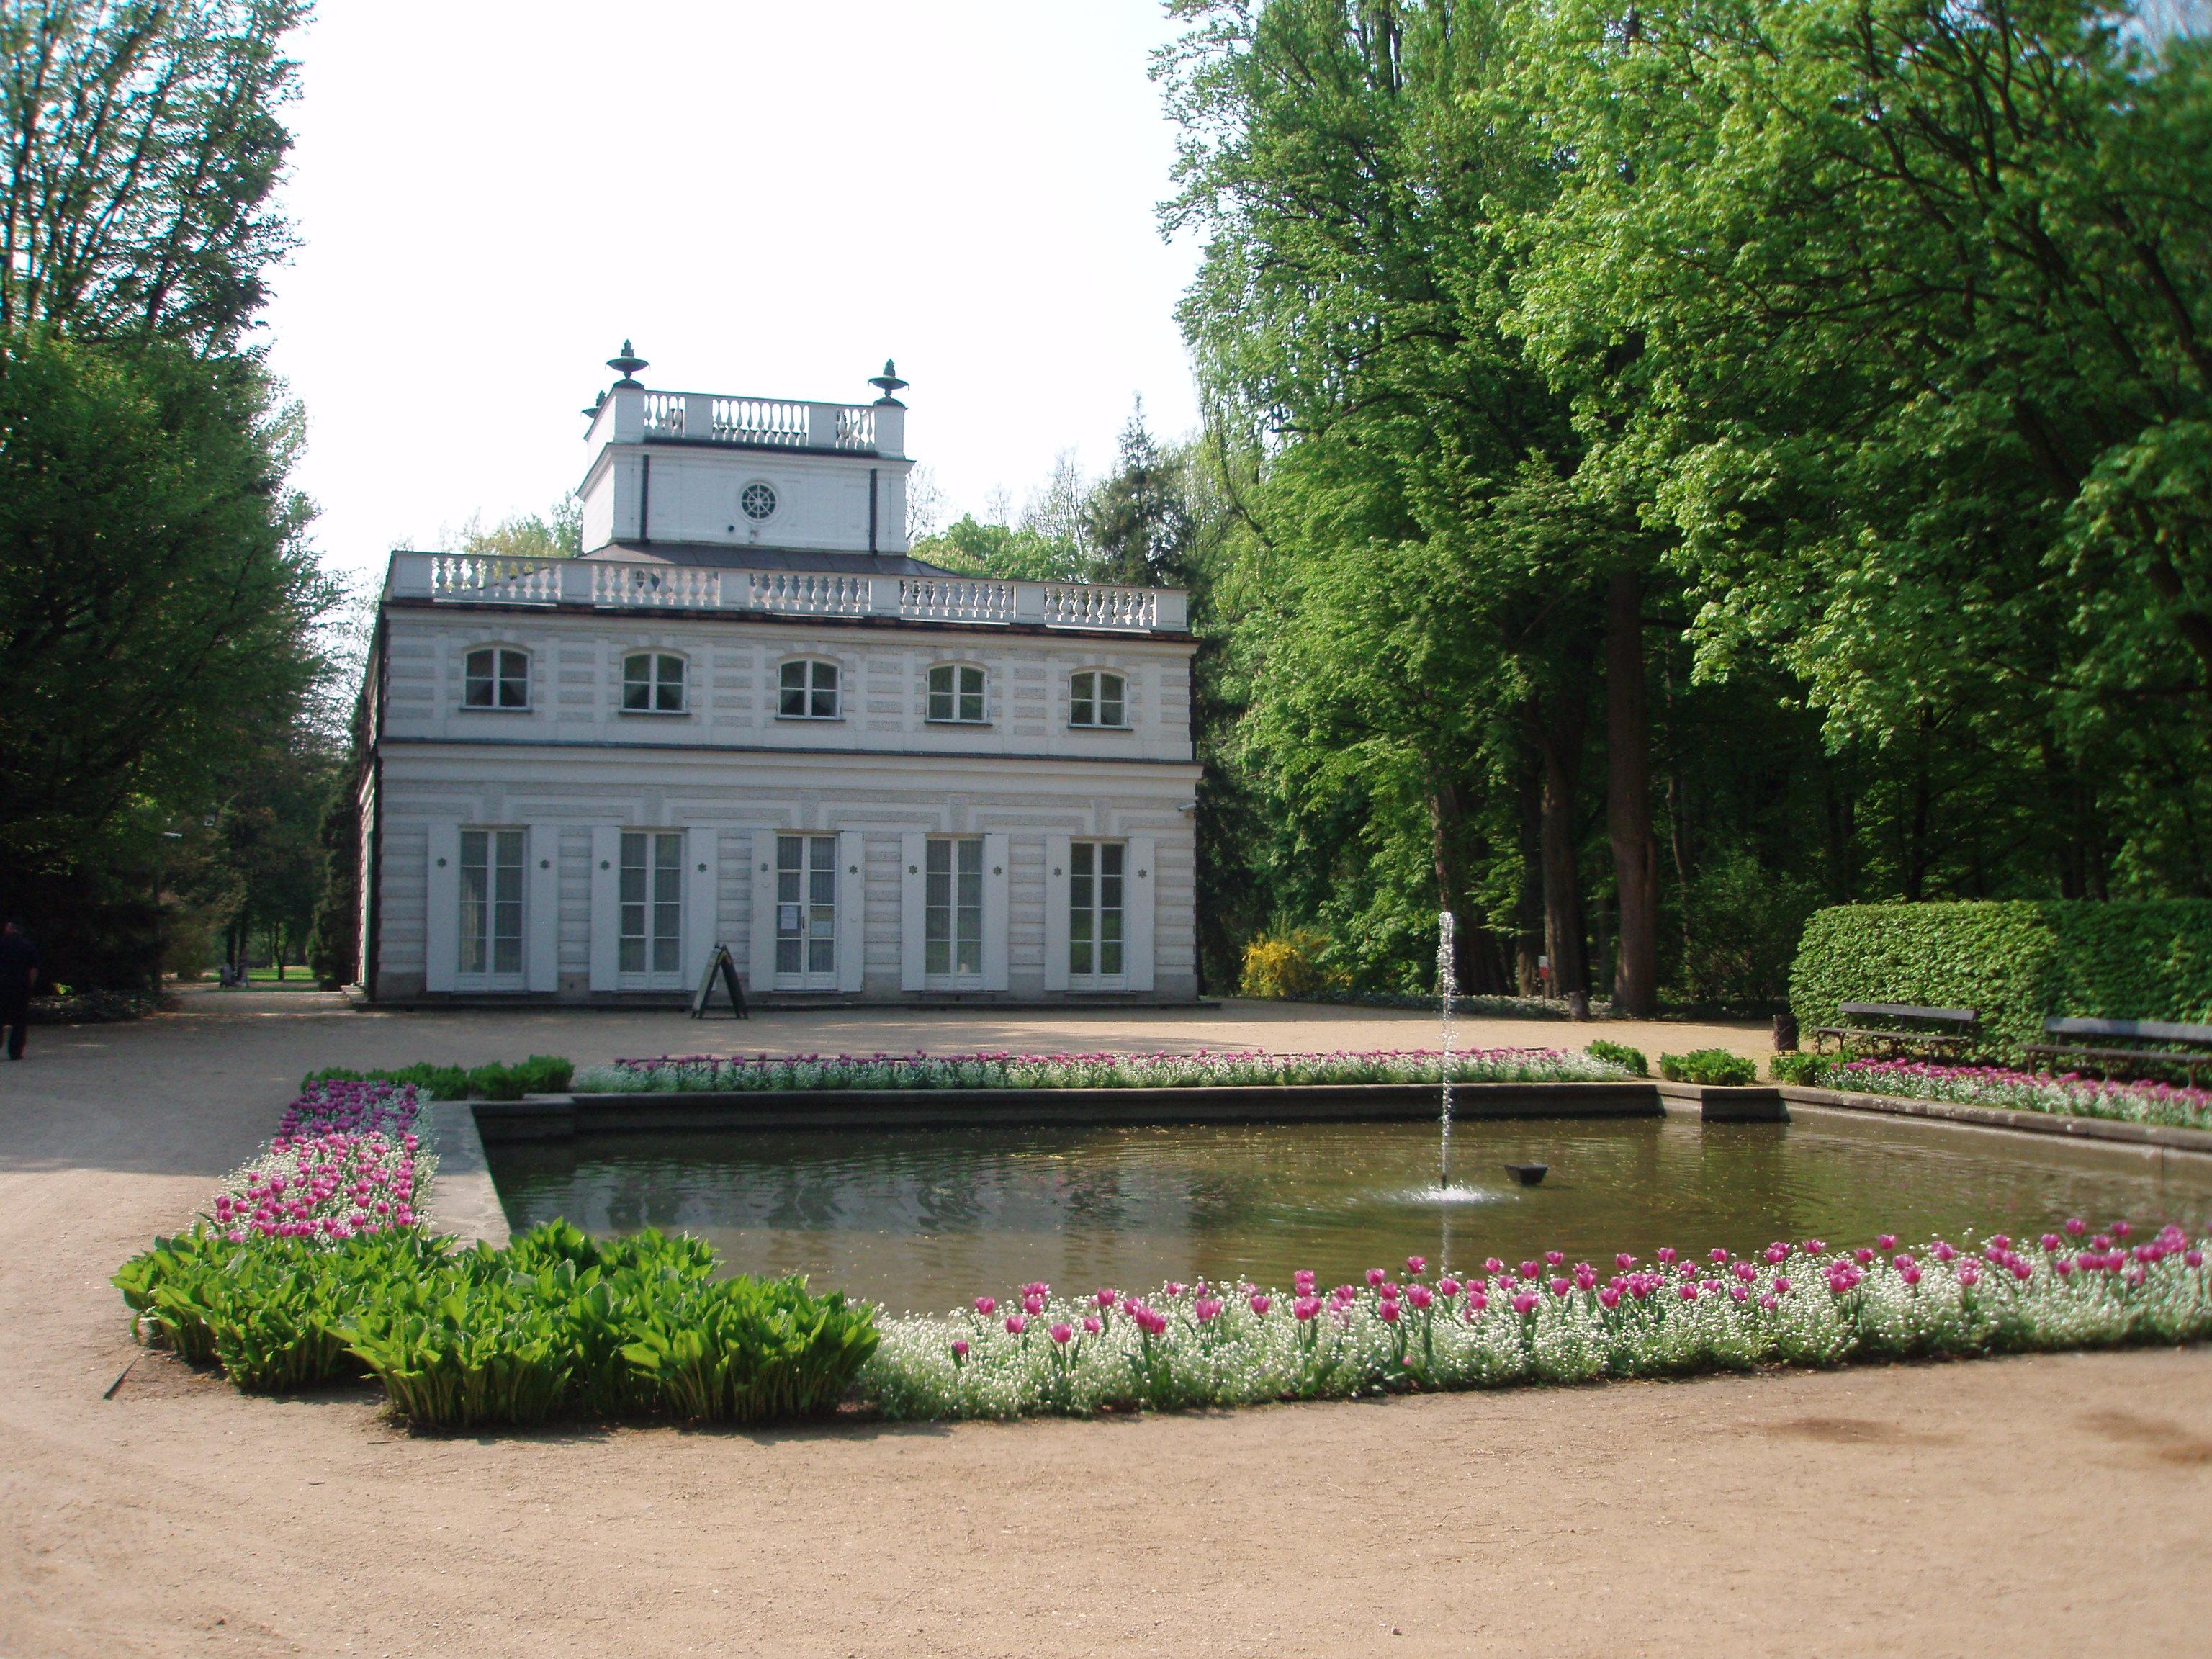 Filełazienki Królewskie Panoramio 3jpg Wikimedia Commons